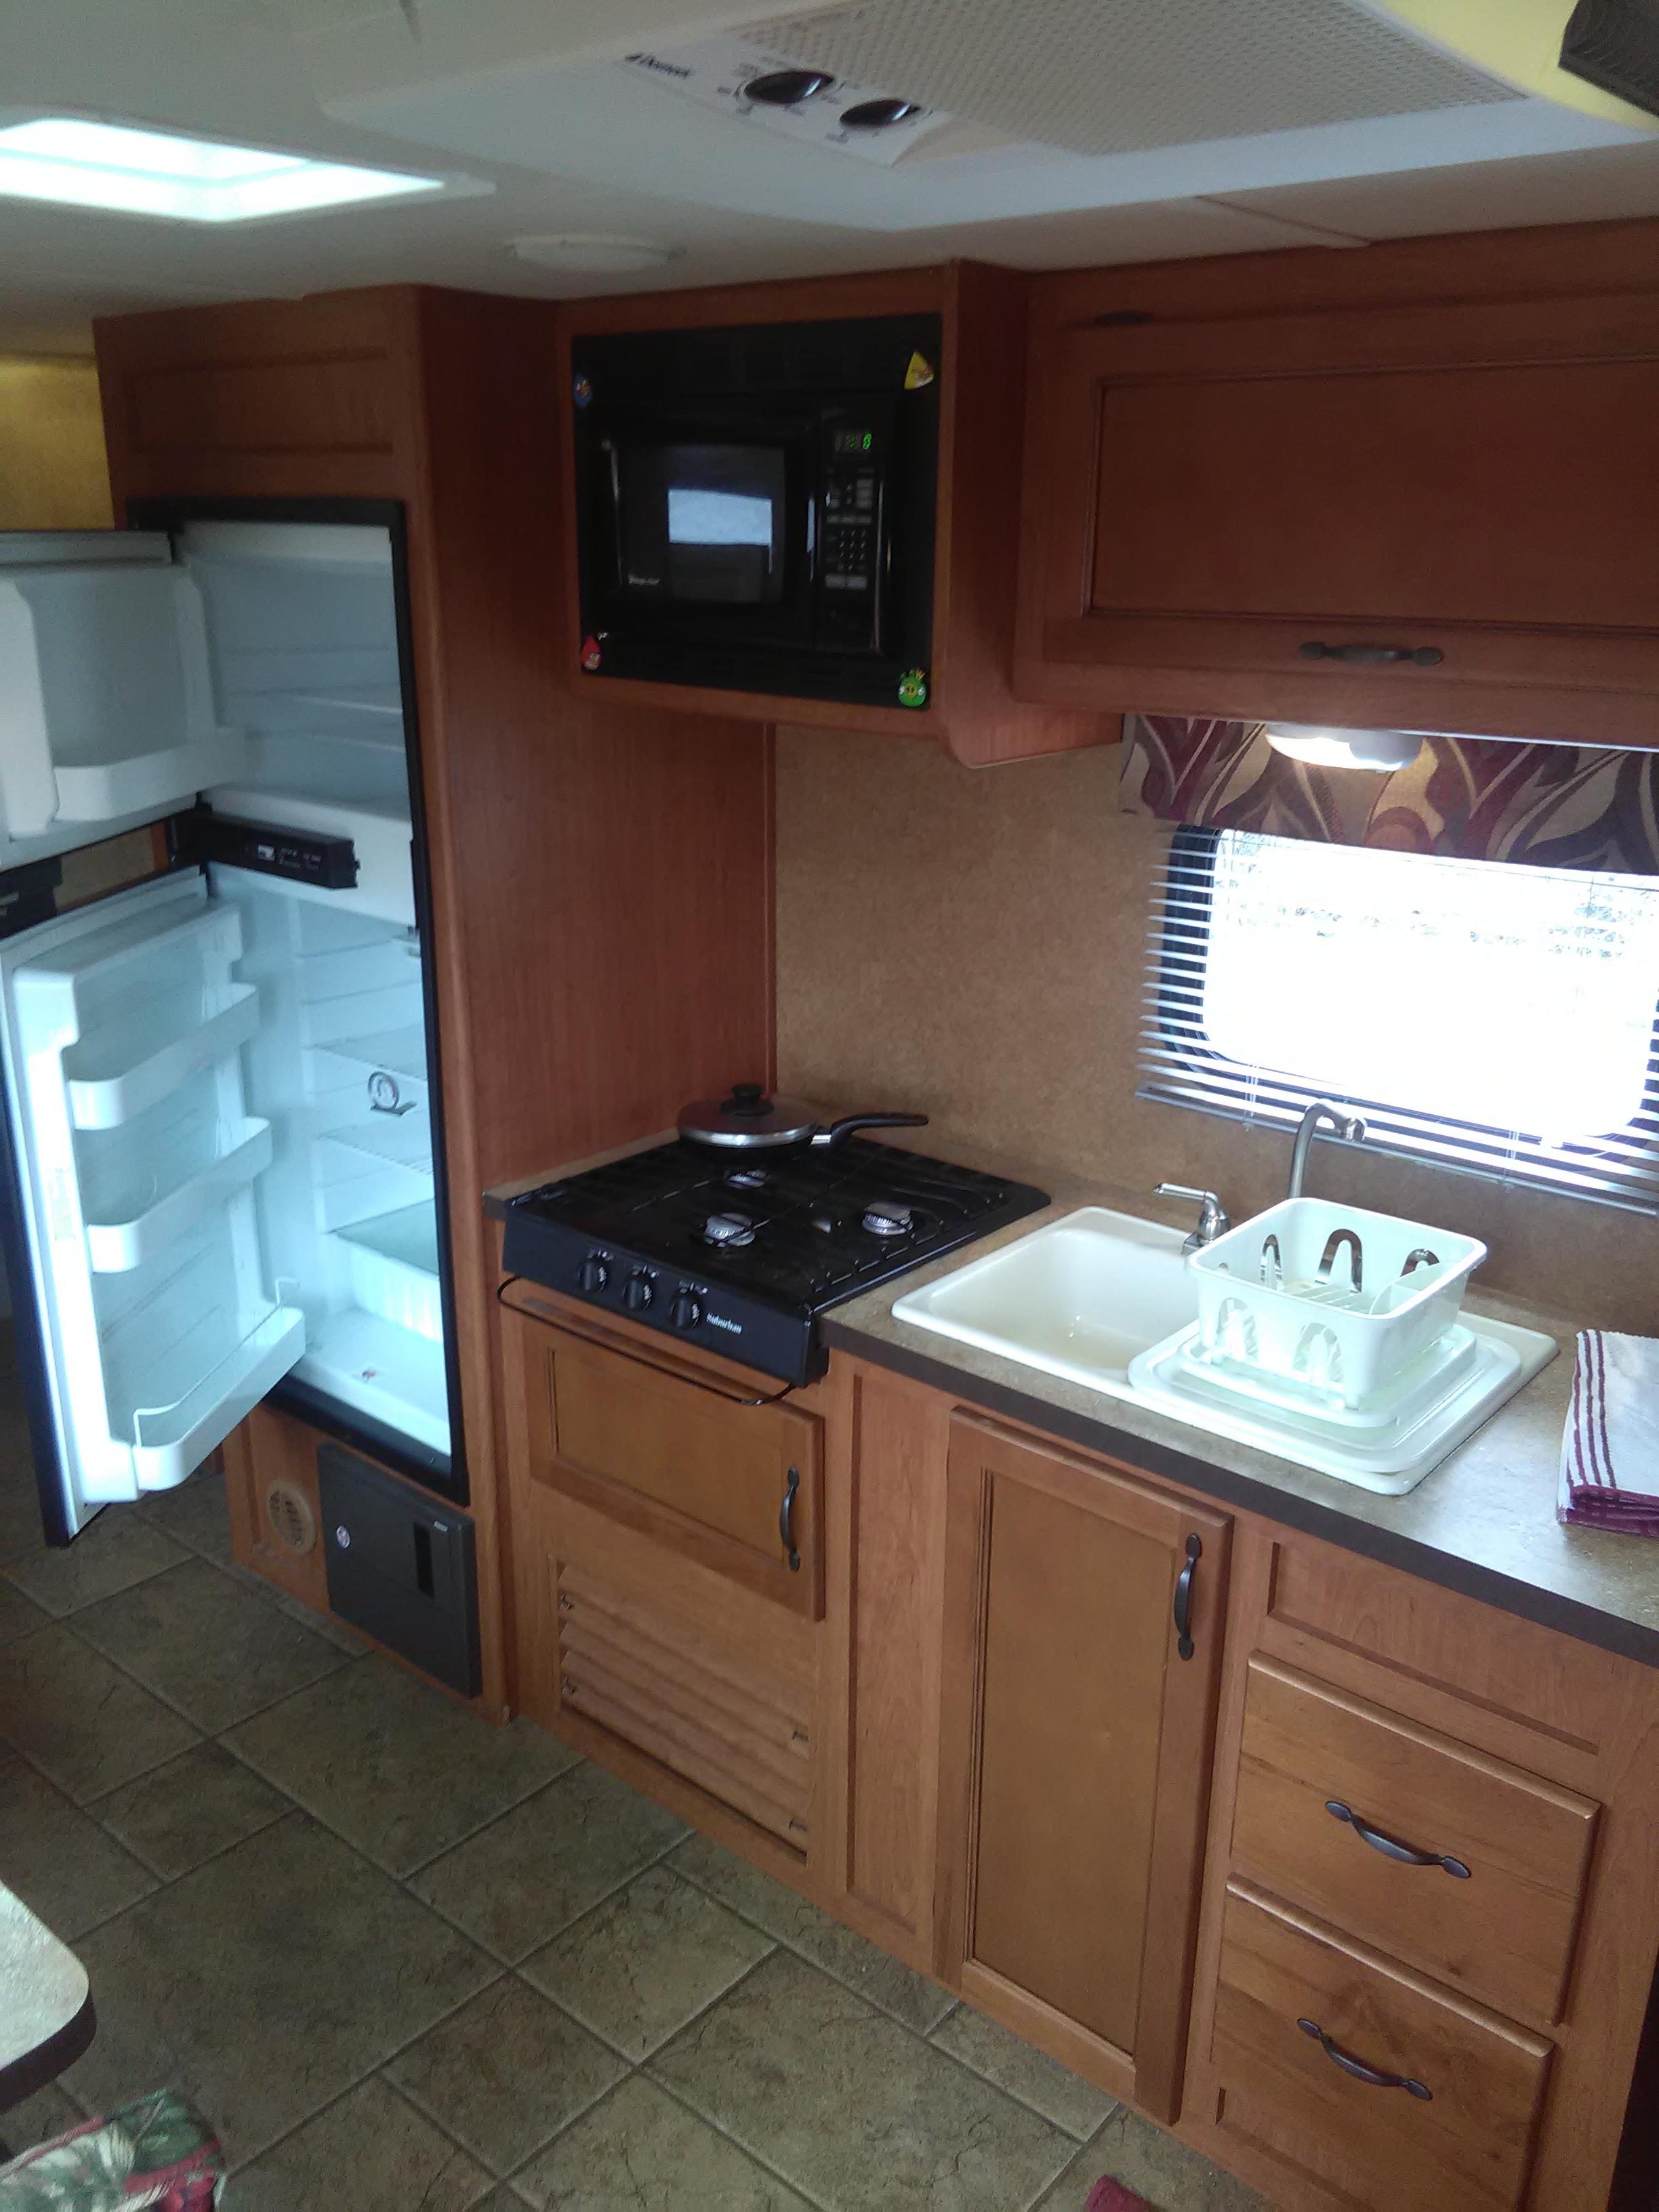 Dual sink, three burner propane stove, microwave, refrigerator/freezer works on propane, or 110VAC hookup.. Forest River Cherokee 2011